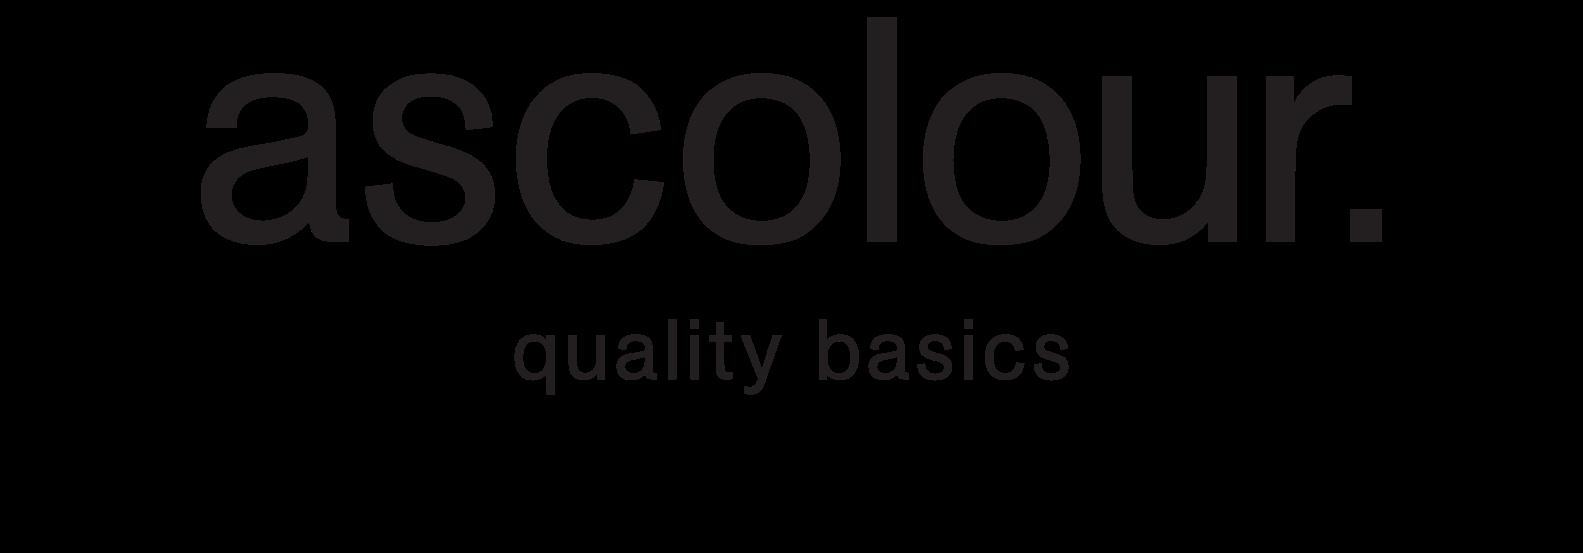 update ASCOLOUR_QUALITY_BASICS_LOCKUP_BLACK_TRANSPARENT